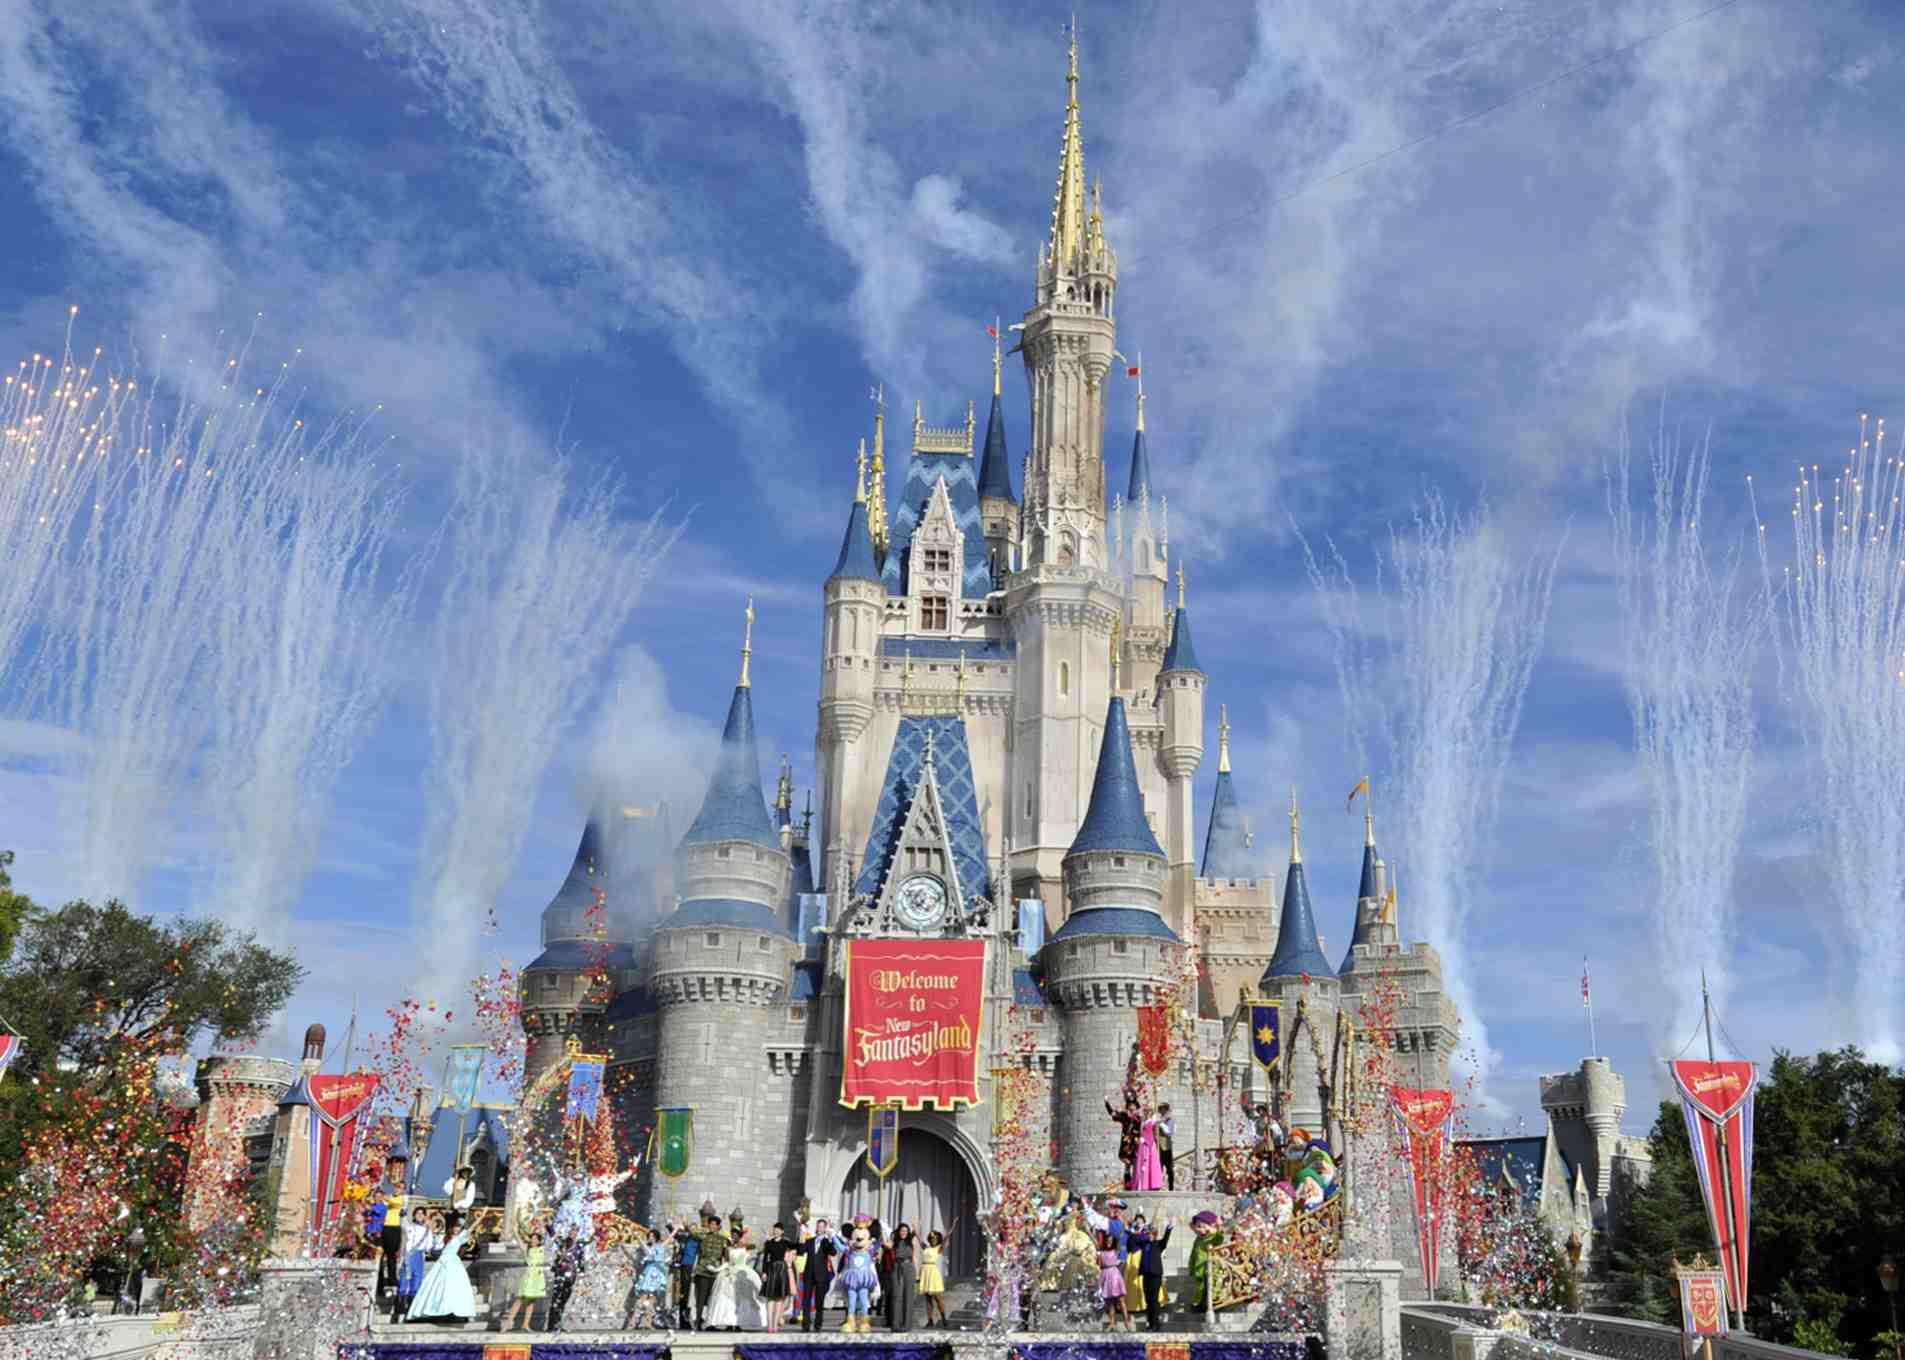 Cinderella Castle at the Magic Kingdom